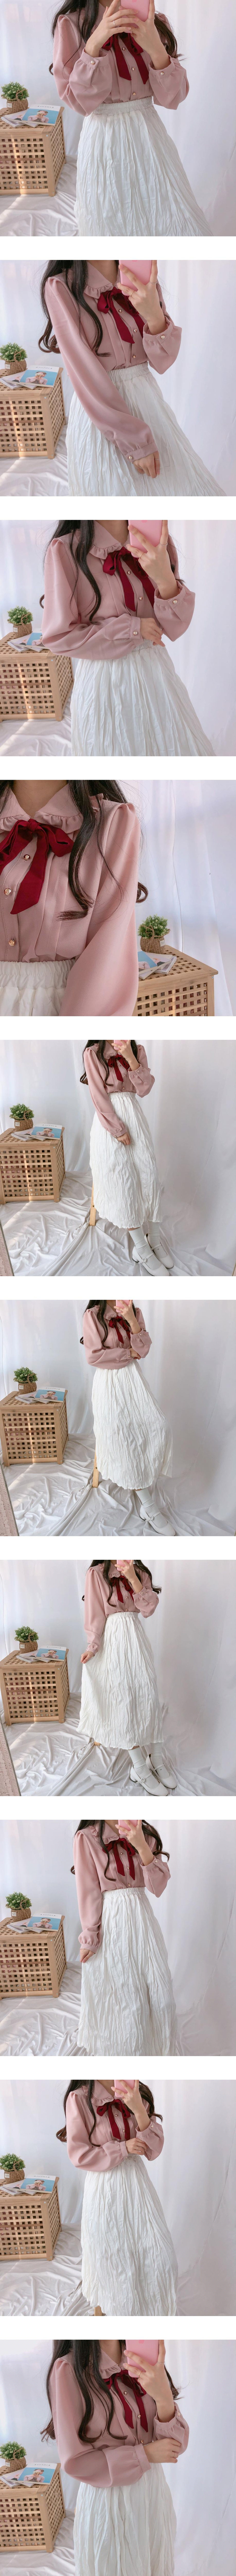 Natural Jacquard Long Skirt